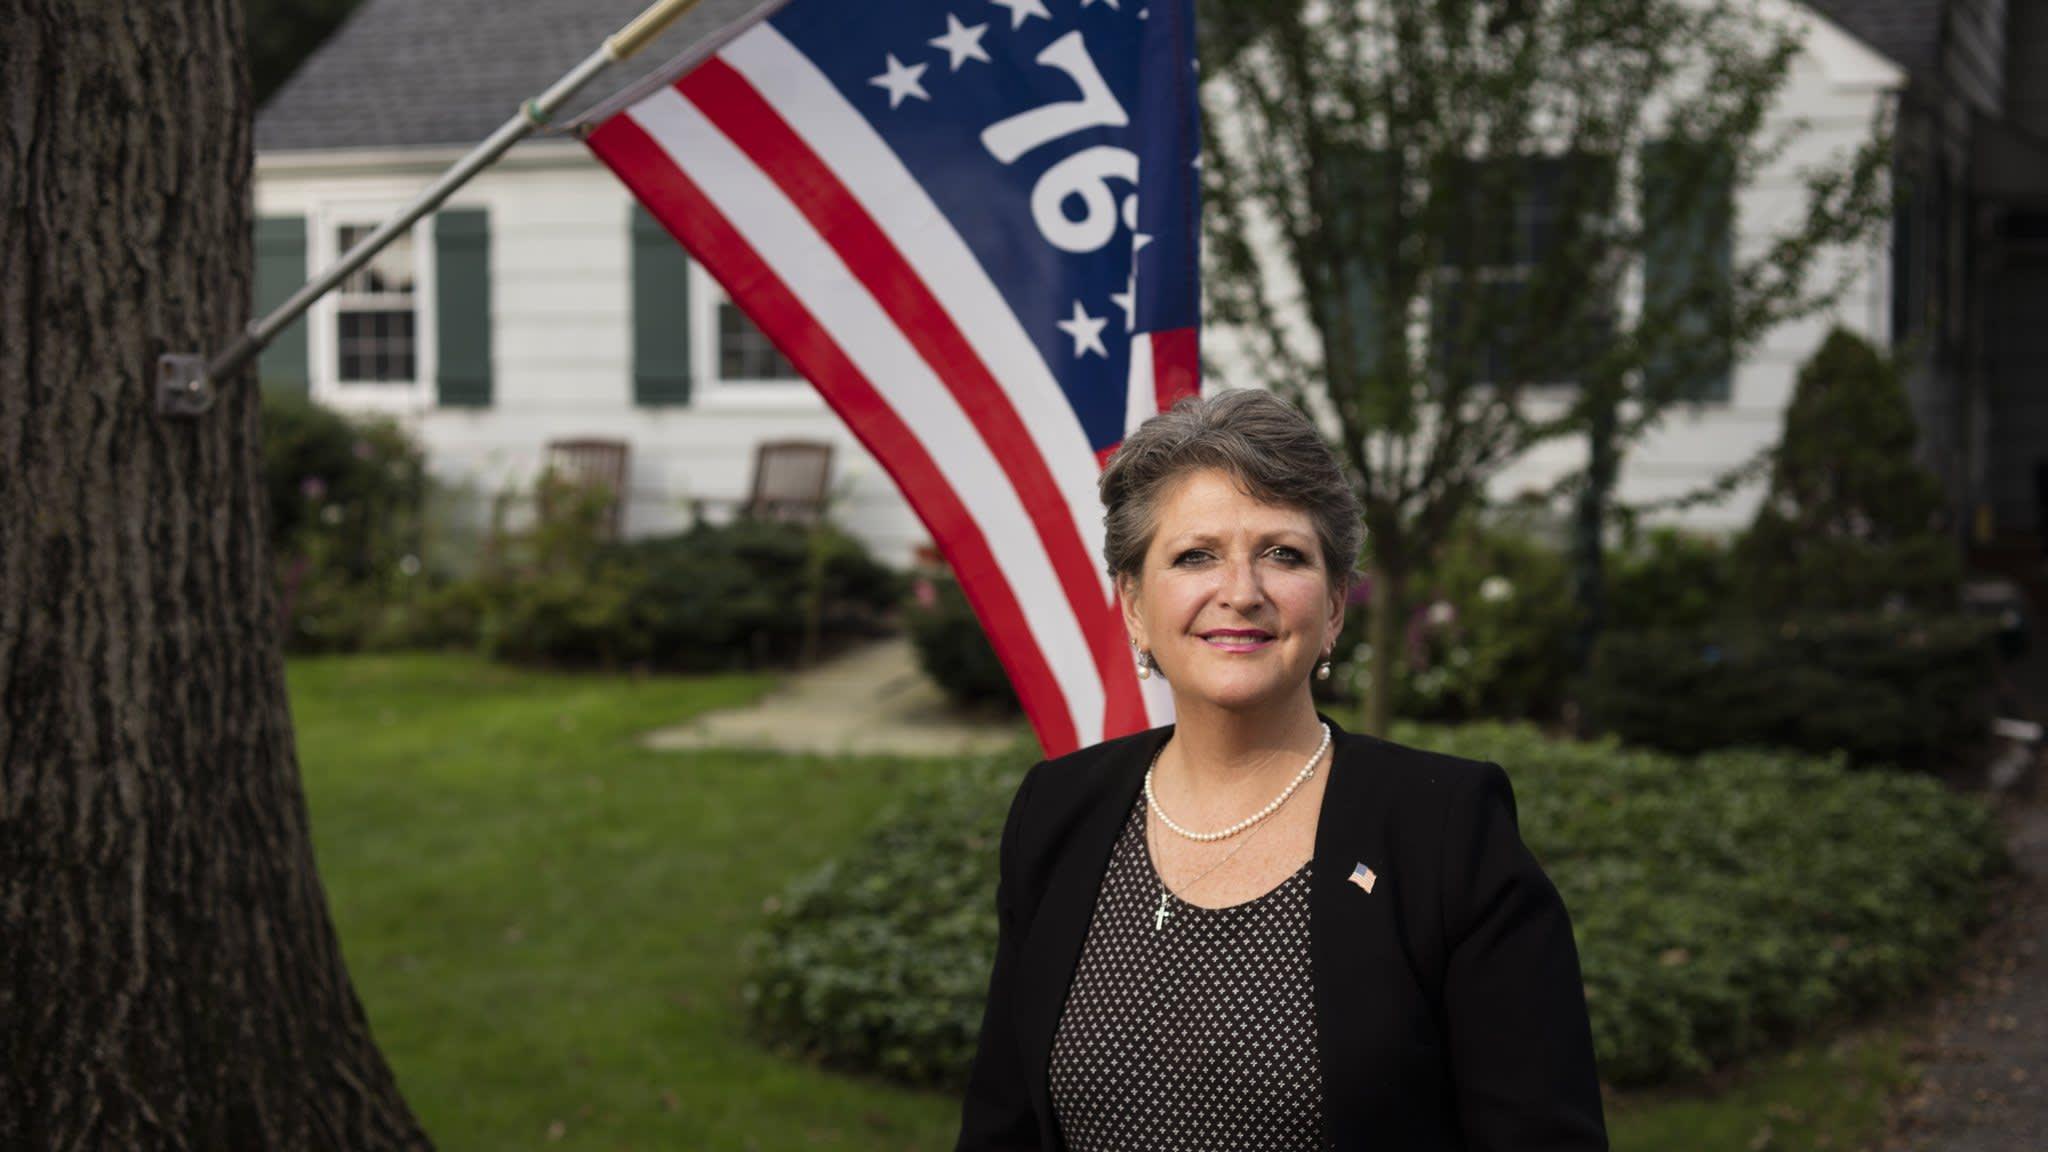 Republican women see Kavanaugh as one of their own